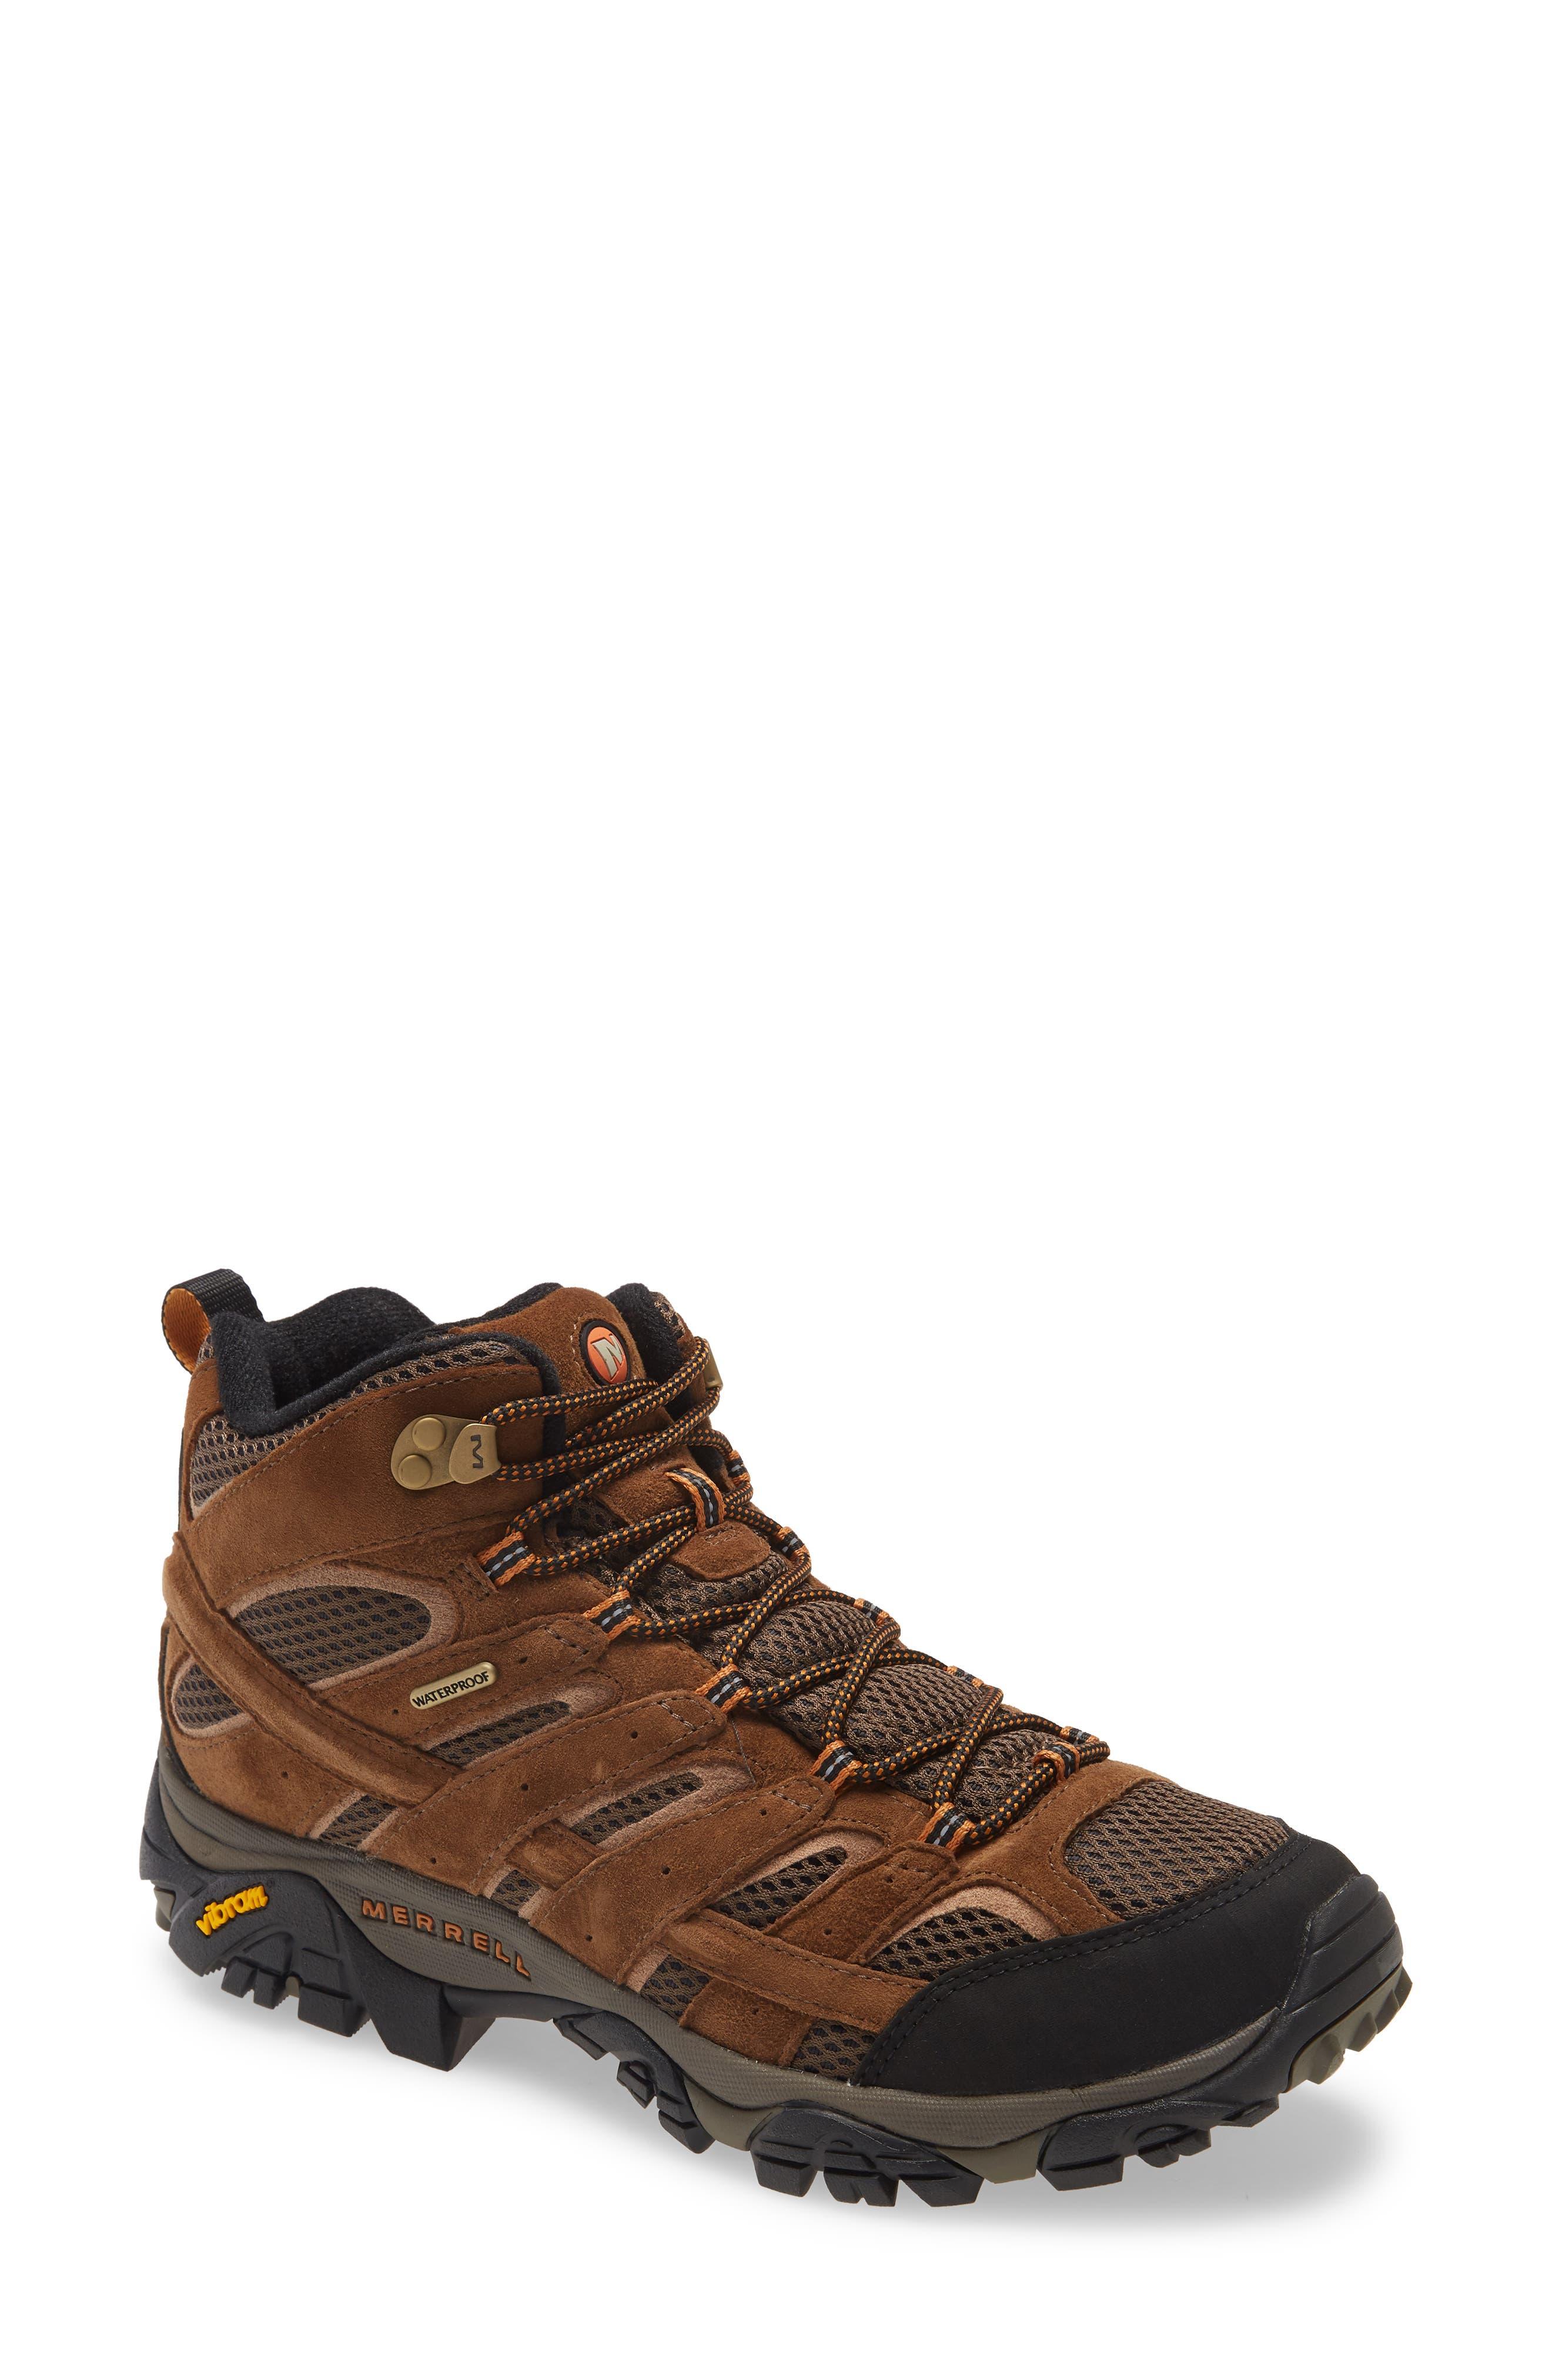 Moab 2 Mid Waterproof Hiking Shoe